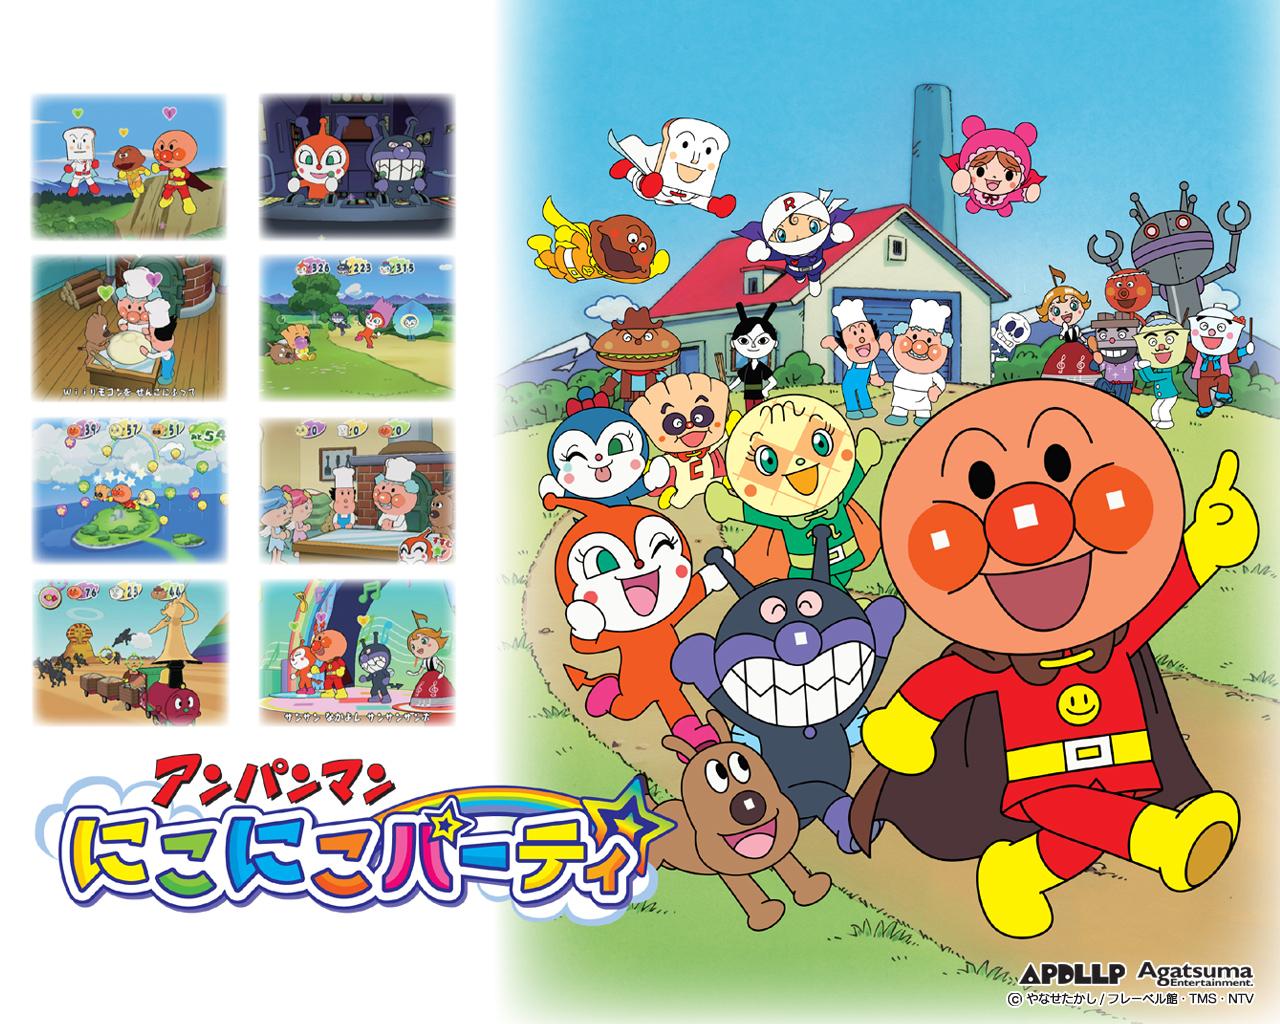 http://www.anpanman.jp/images/otanoshimi/index/download/nikoniko/1280x1024.jpg